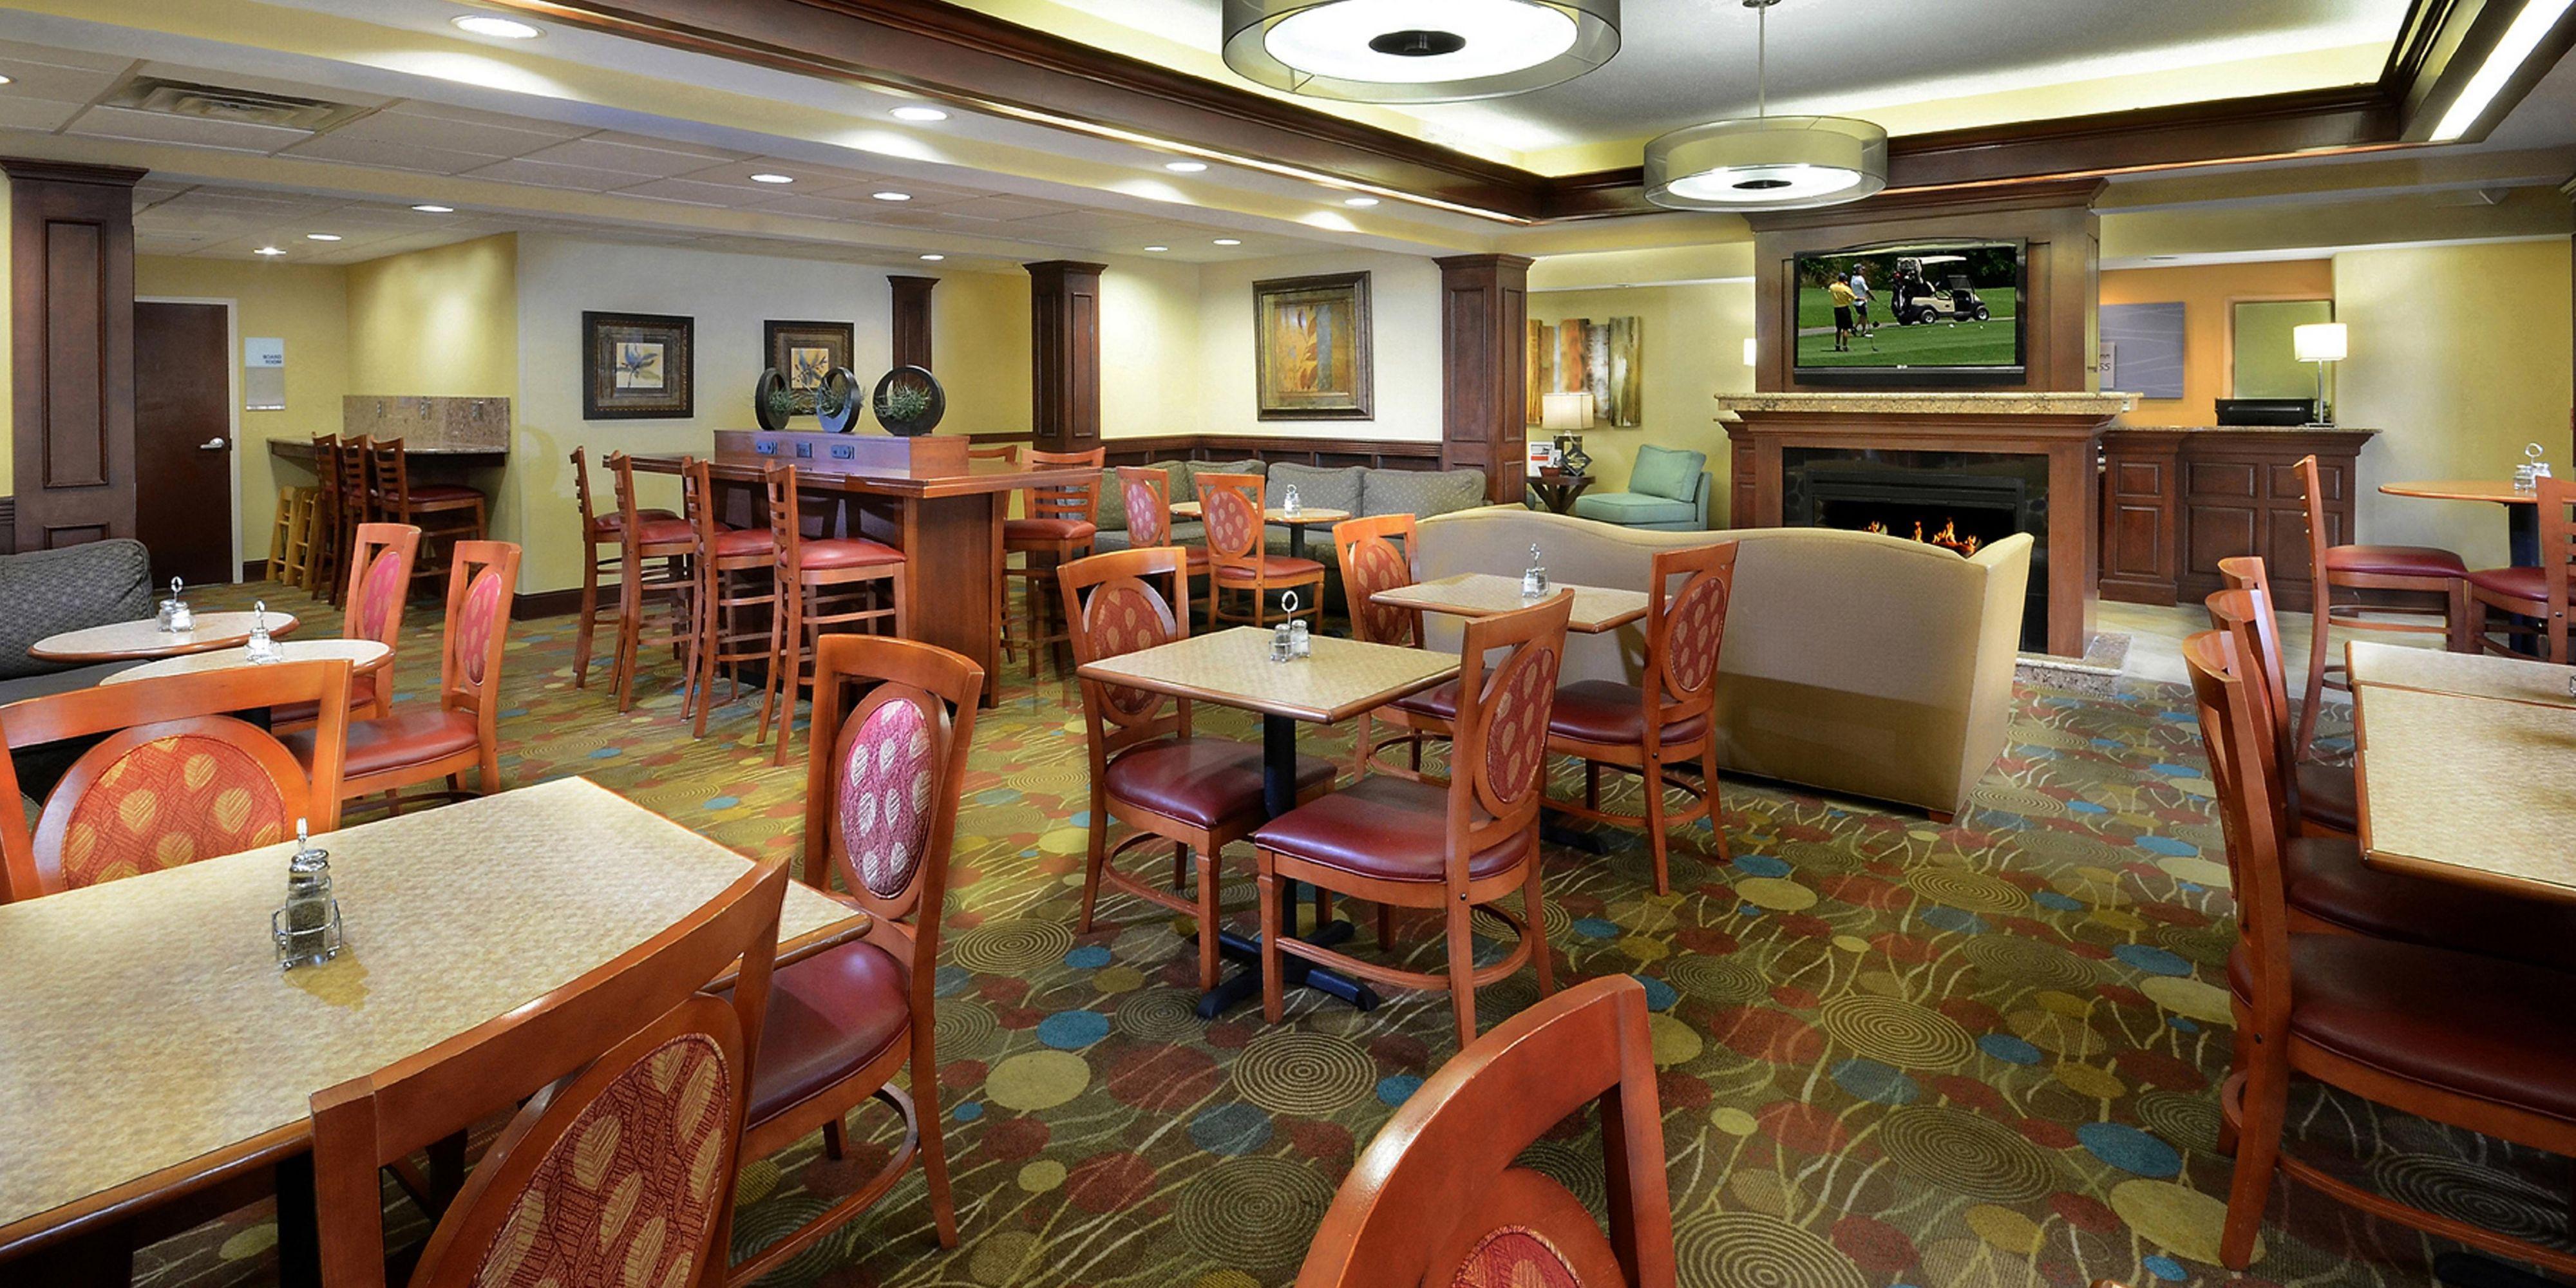 Holiday Inn Express RaleighDurham Airport Hotel by IHG